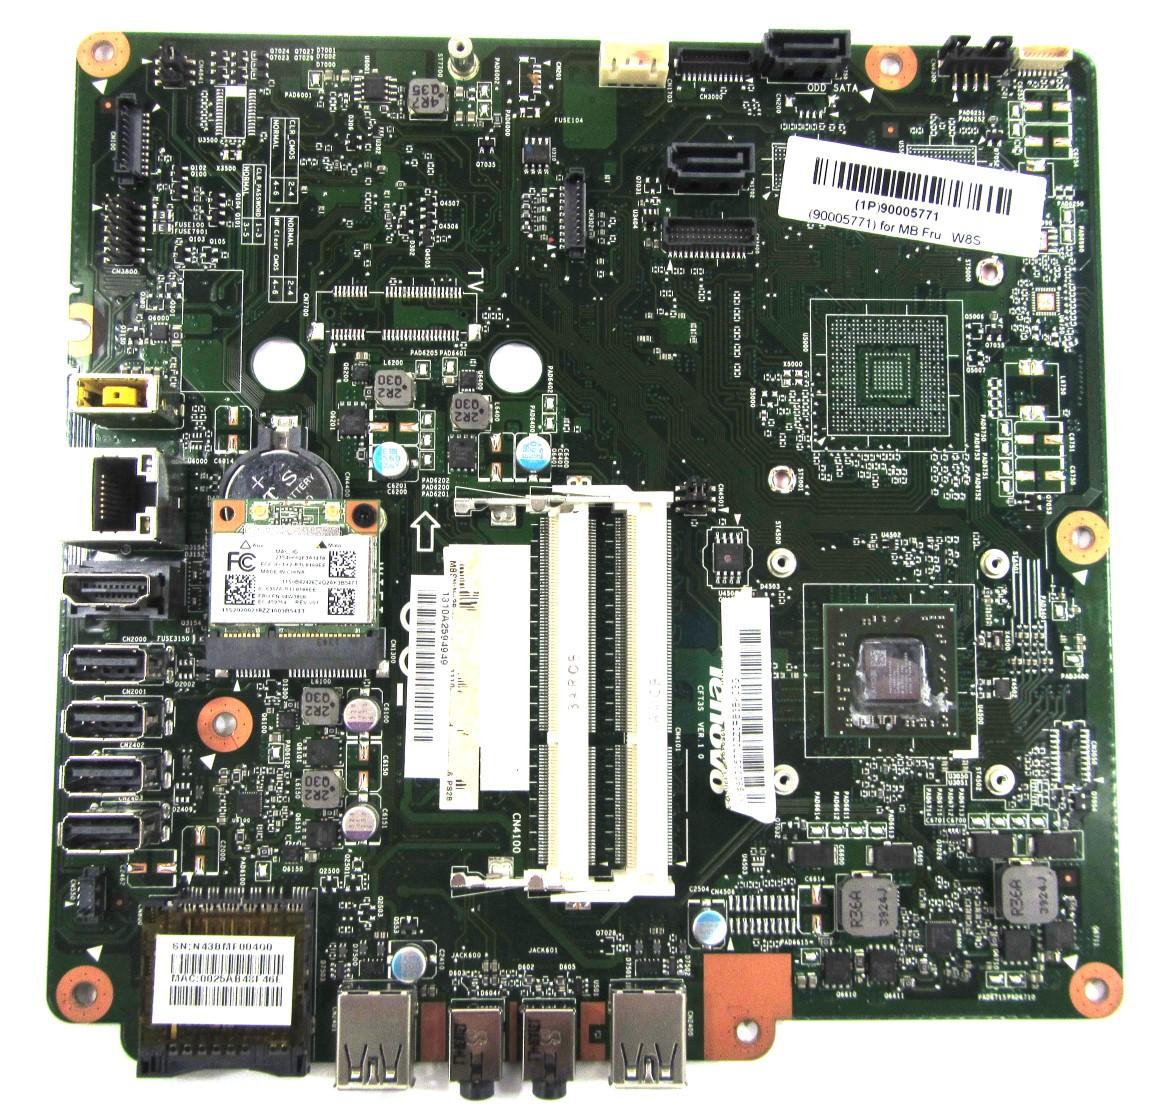 Lenovo IdeaCentre C365 Motherboard /w AMD A4-5000 CPU - 1310A2594949 / 90005771